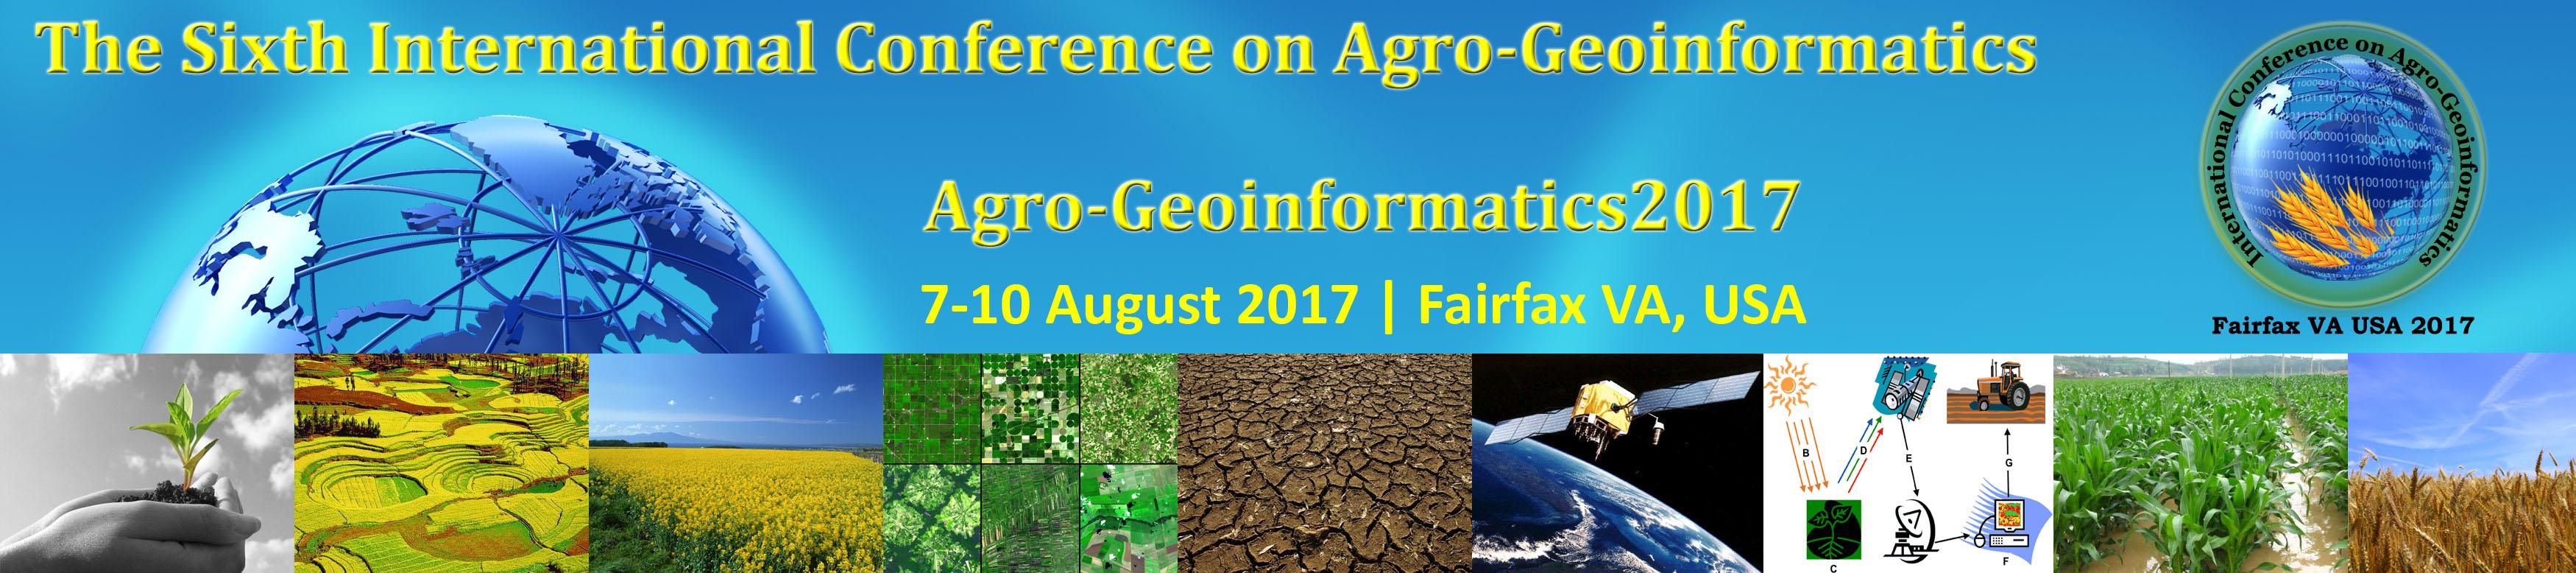 Agro-Geoinformatics 2017